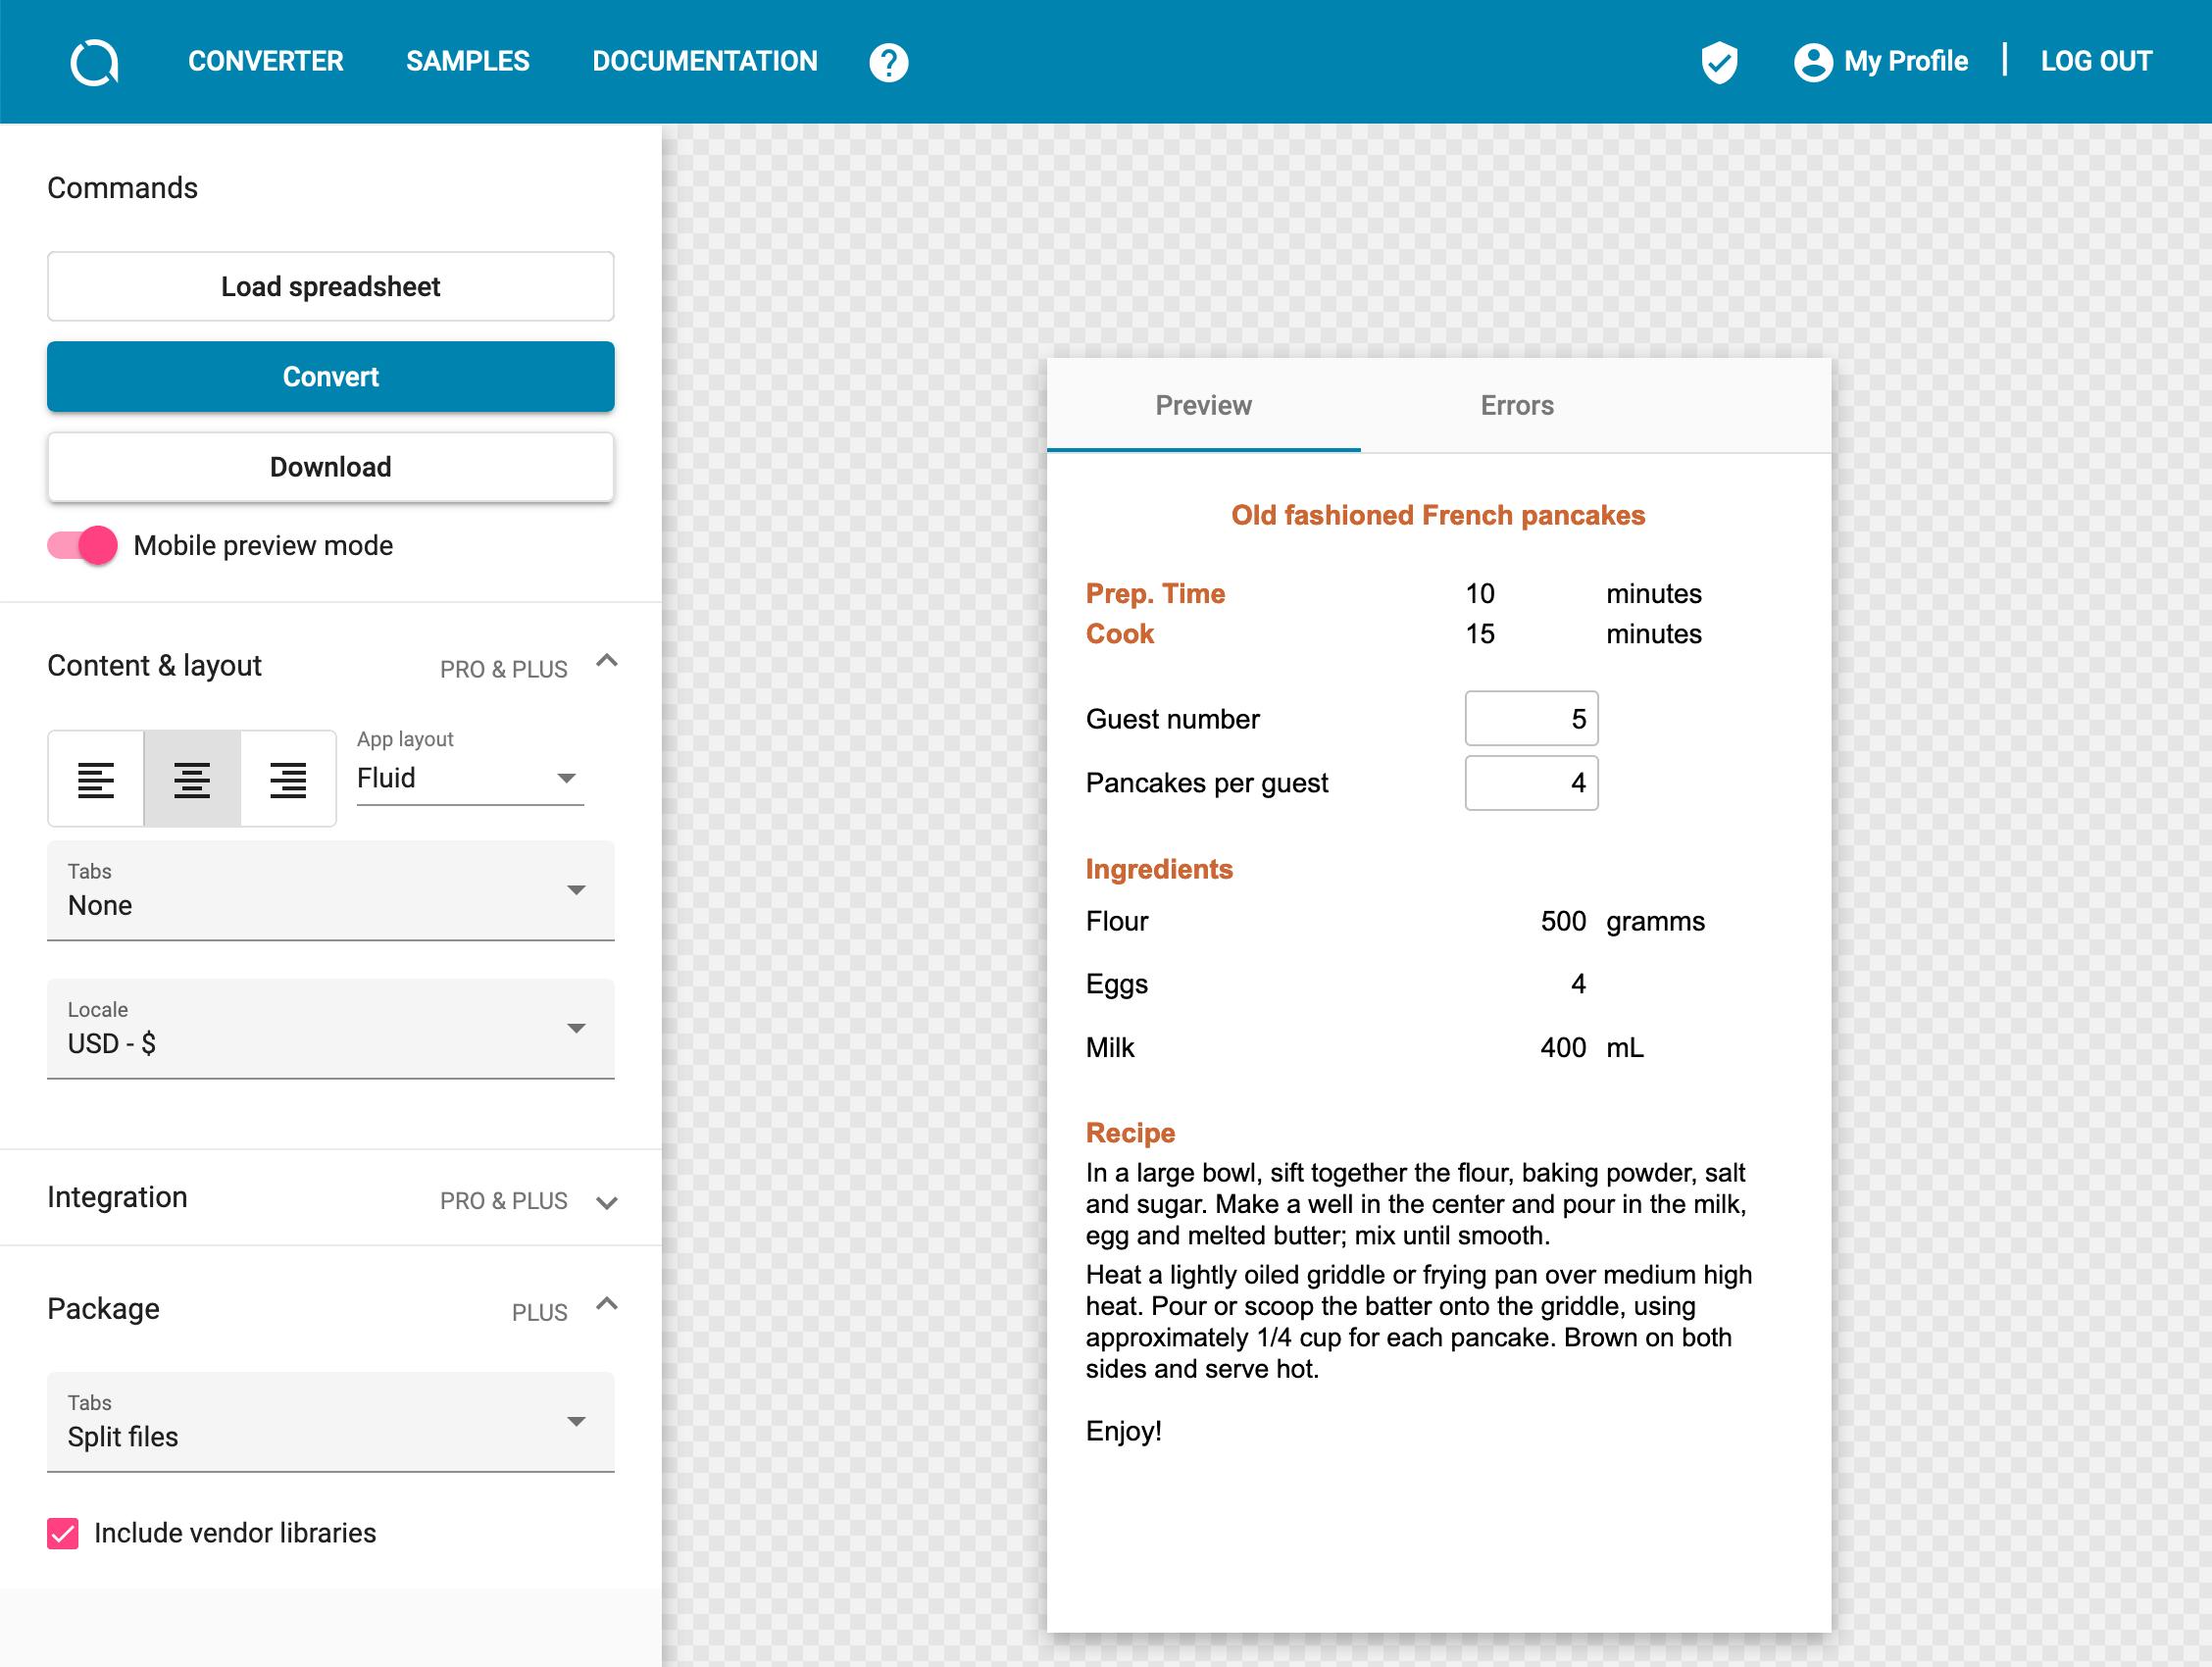 Converti un file Excel in un'app mobile